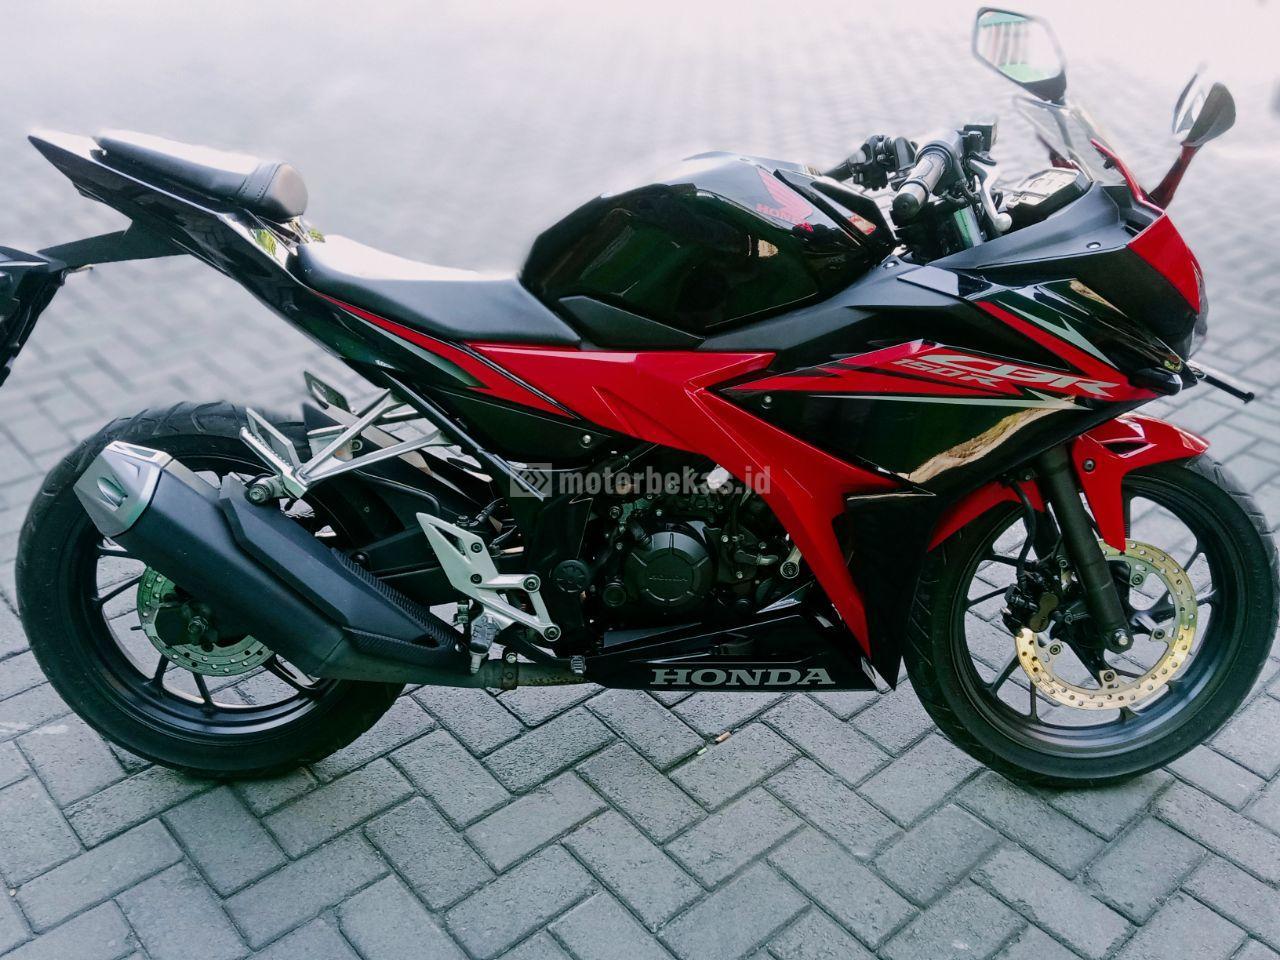 HONDA CBR 150R FI 3188 motorbekas.id